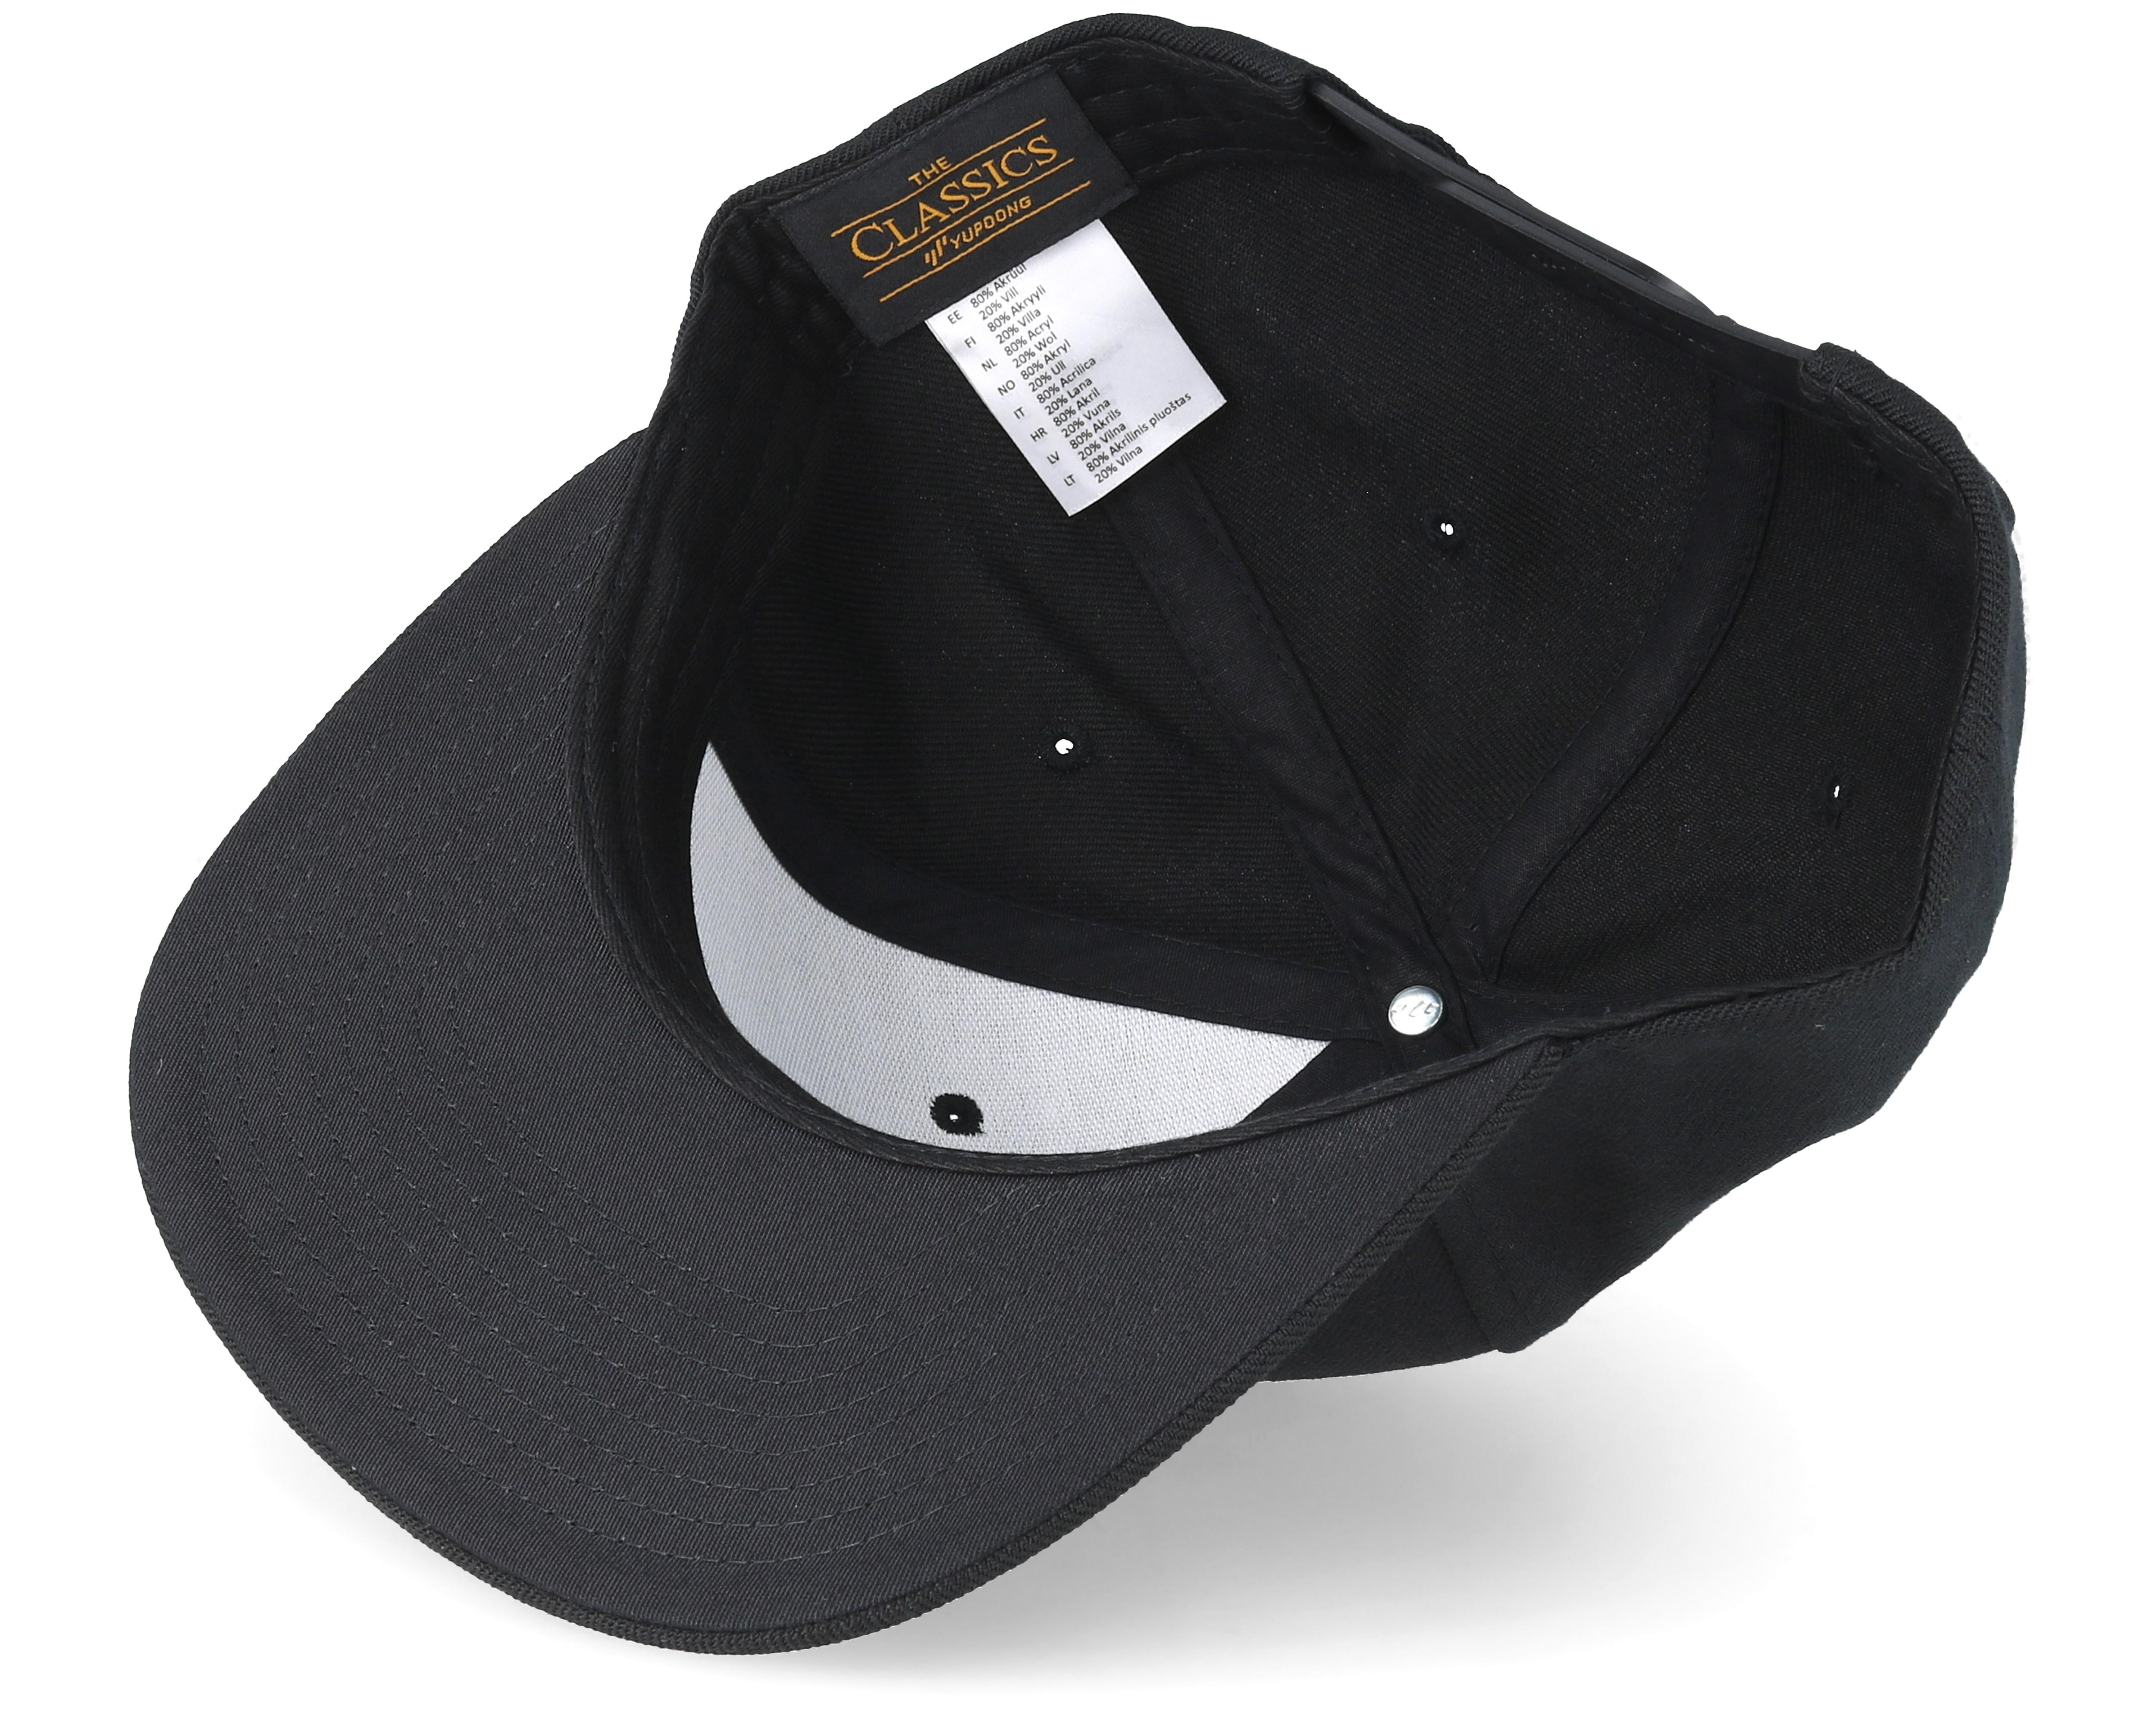 02dfa69af1c02 Custom Caps   Hats - Design   Create Online